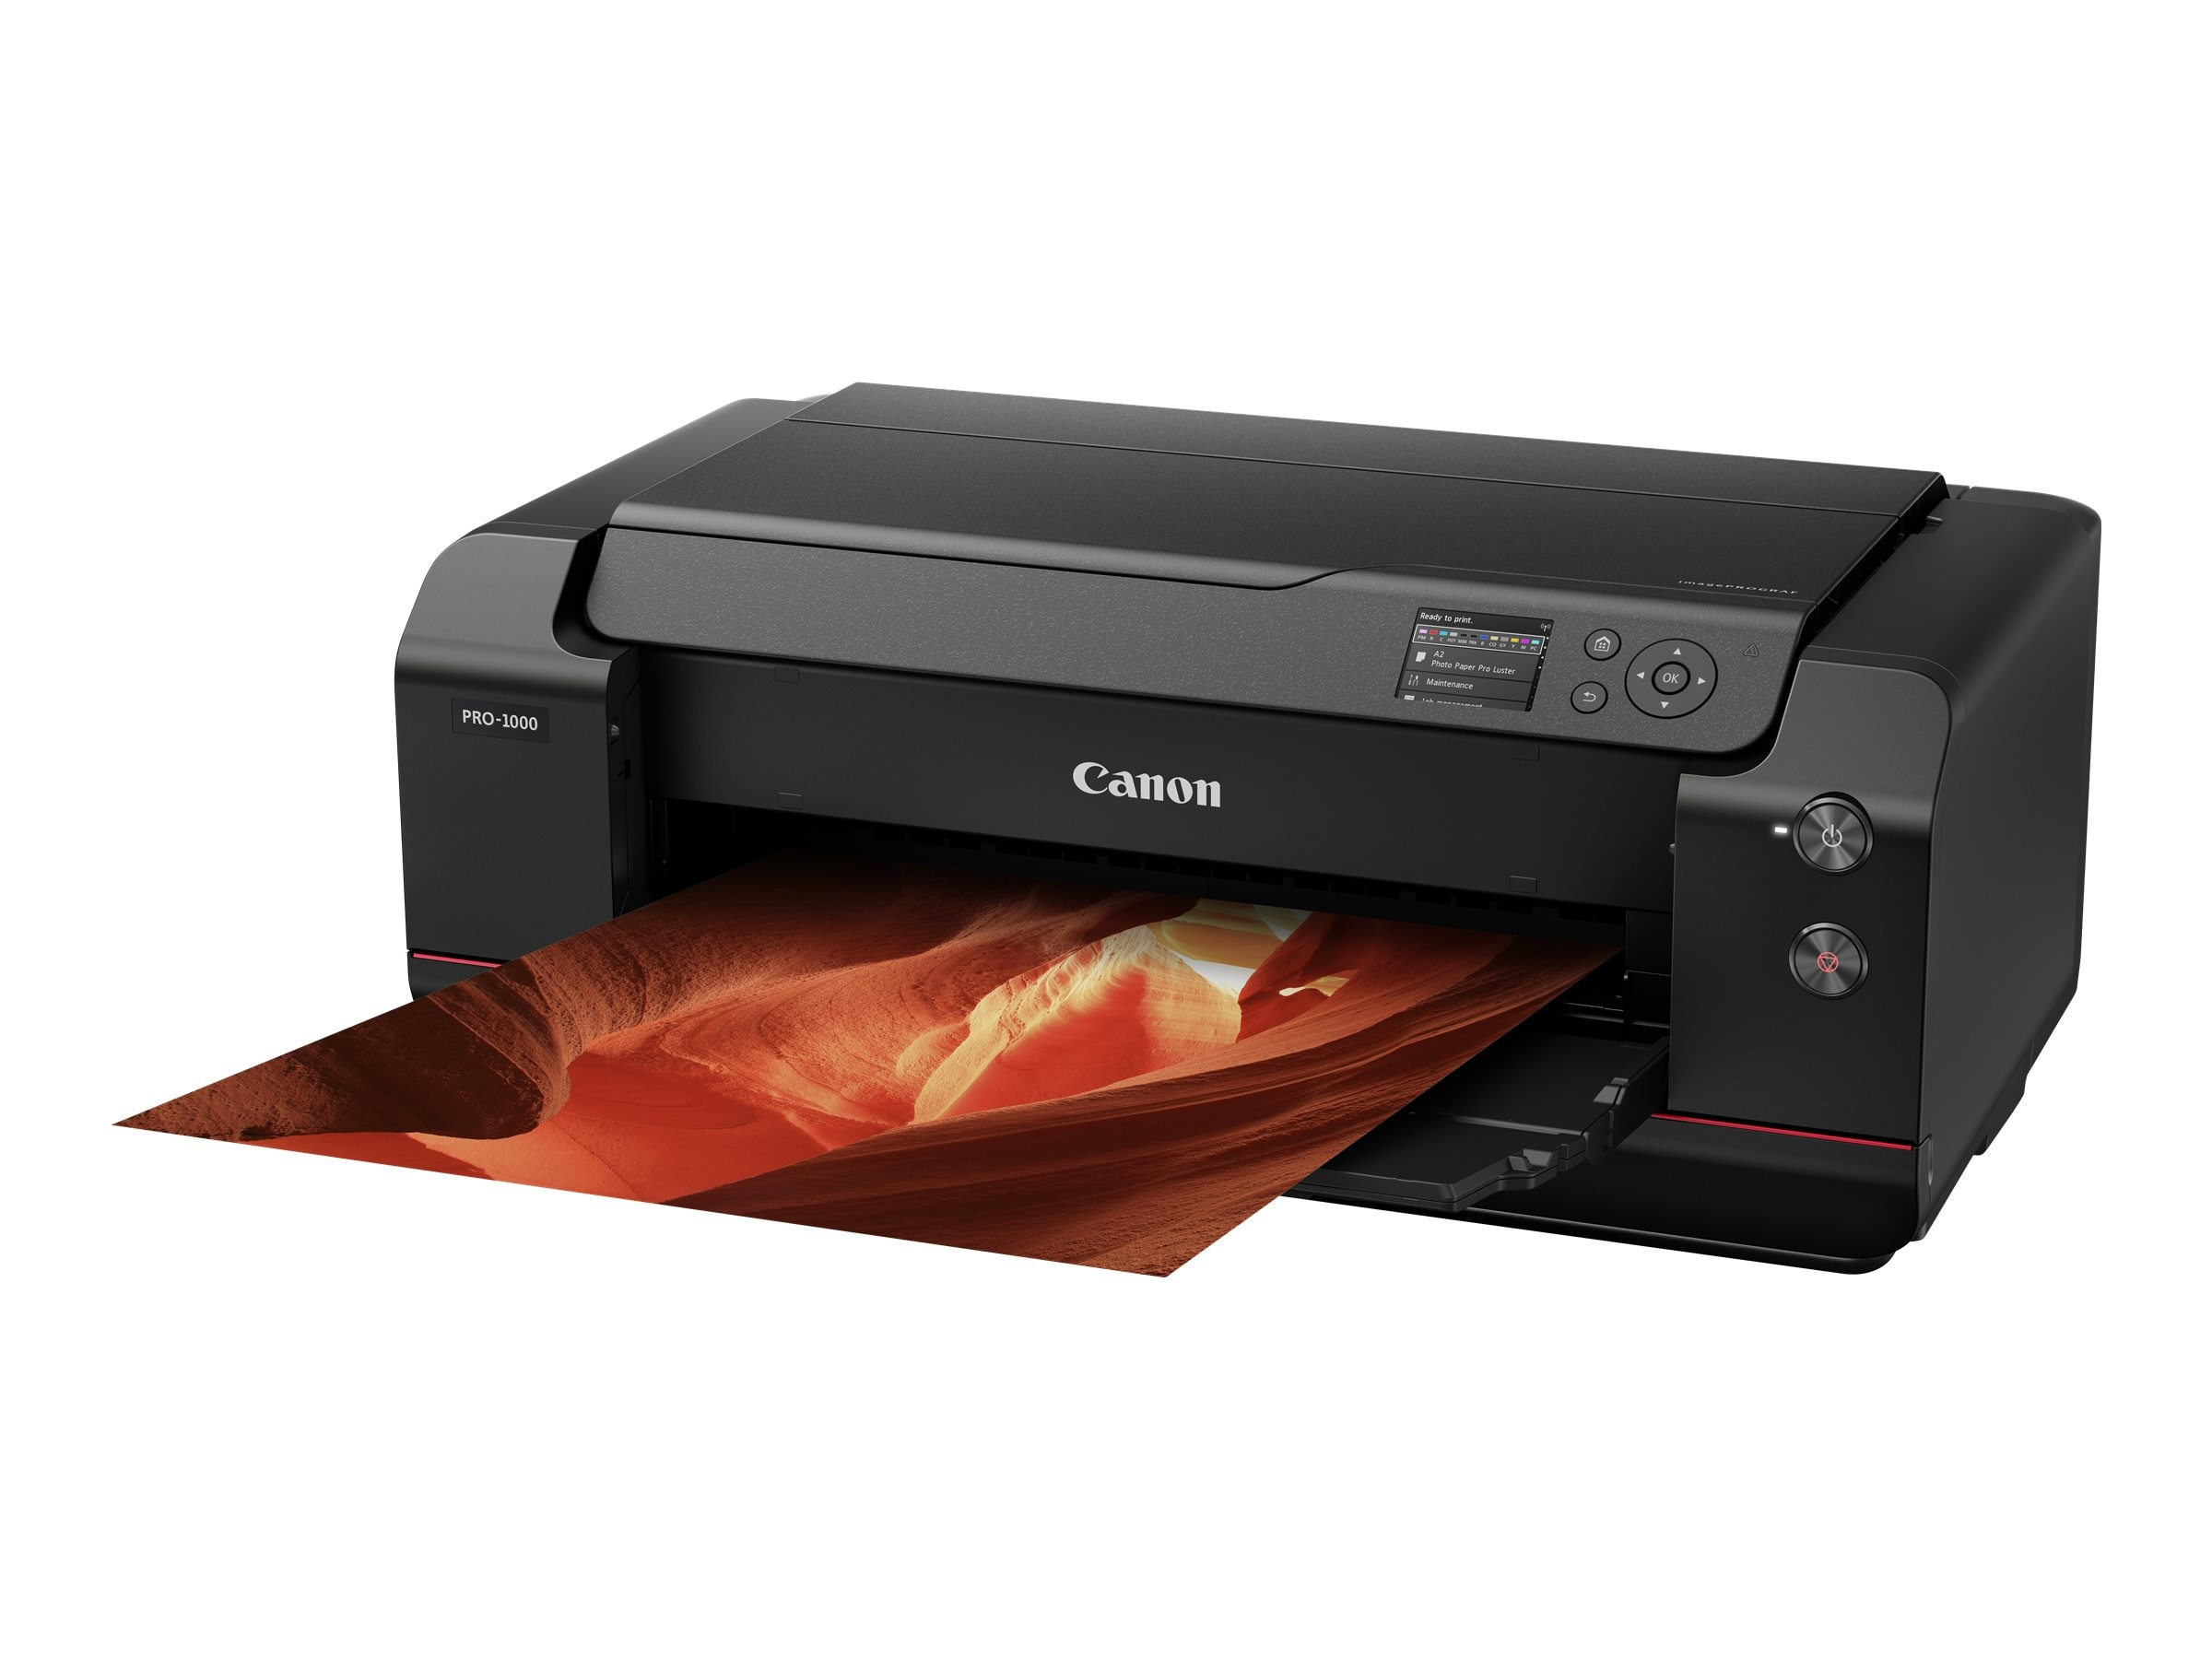 Canon imagePROGRAF PRO-1000 17 Professional Photographic Inkjet Printer, 0608C002, 34124618, Printers - Ink-jet